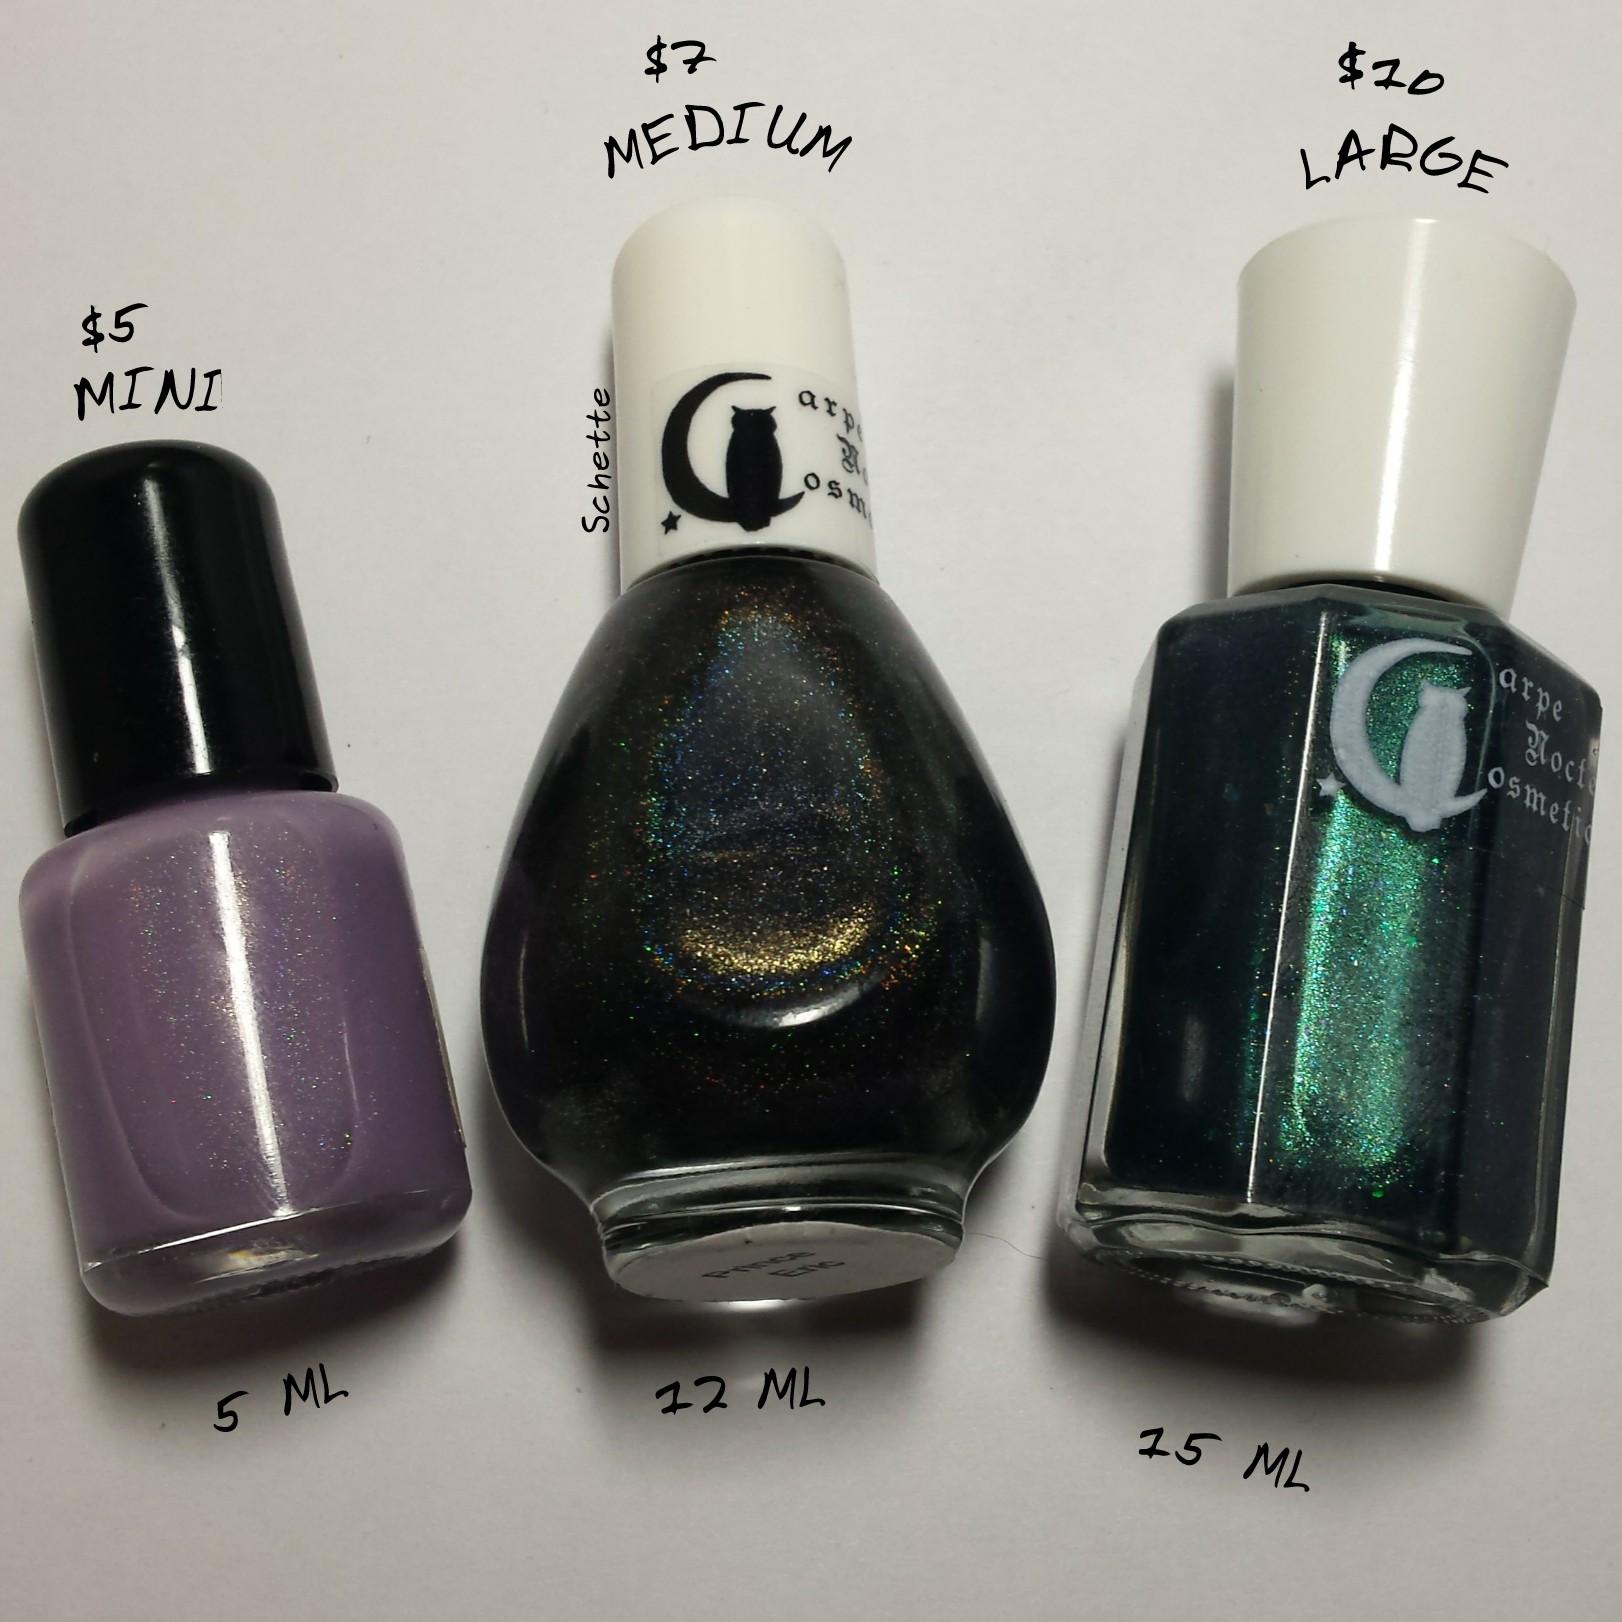 Carpe Noctem Cosmetics - Comparison of bottles